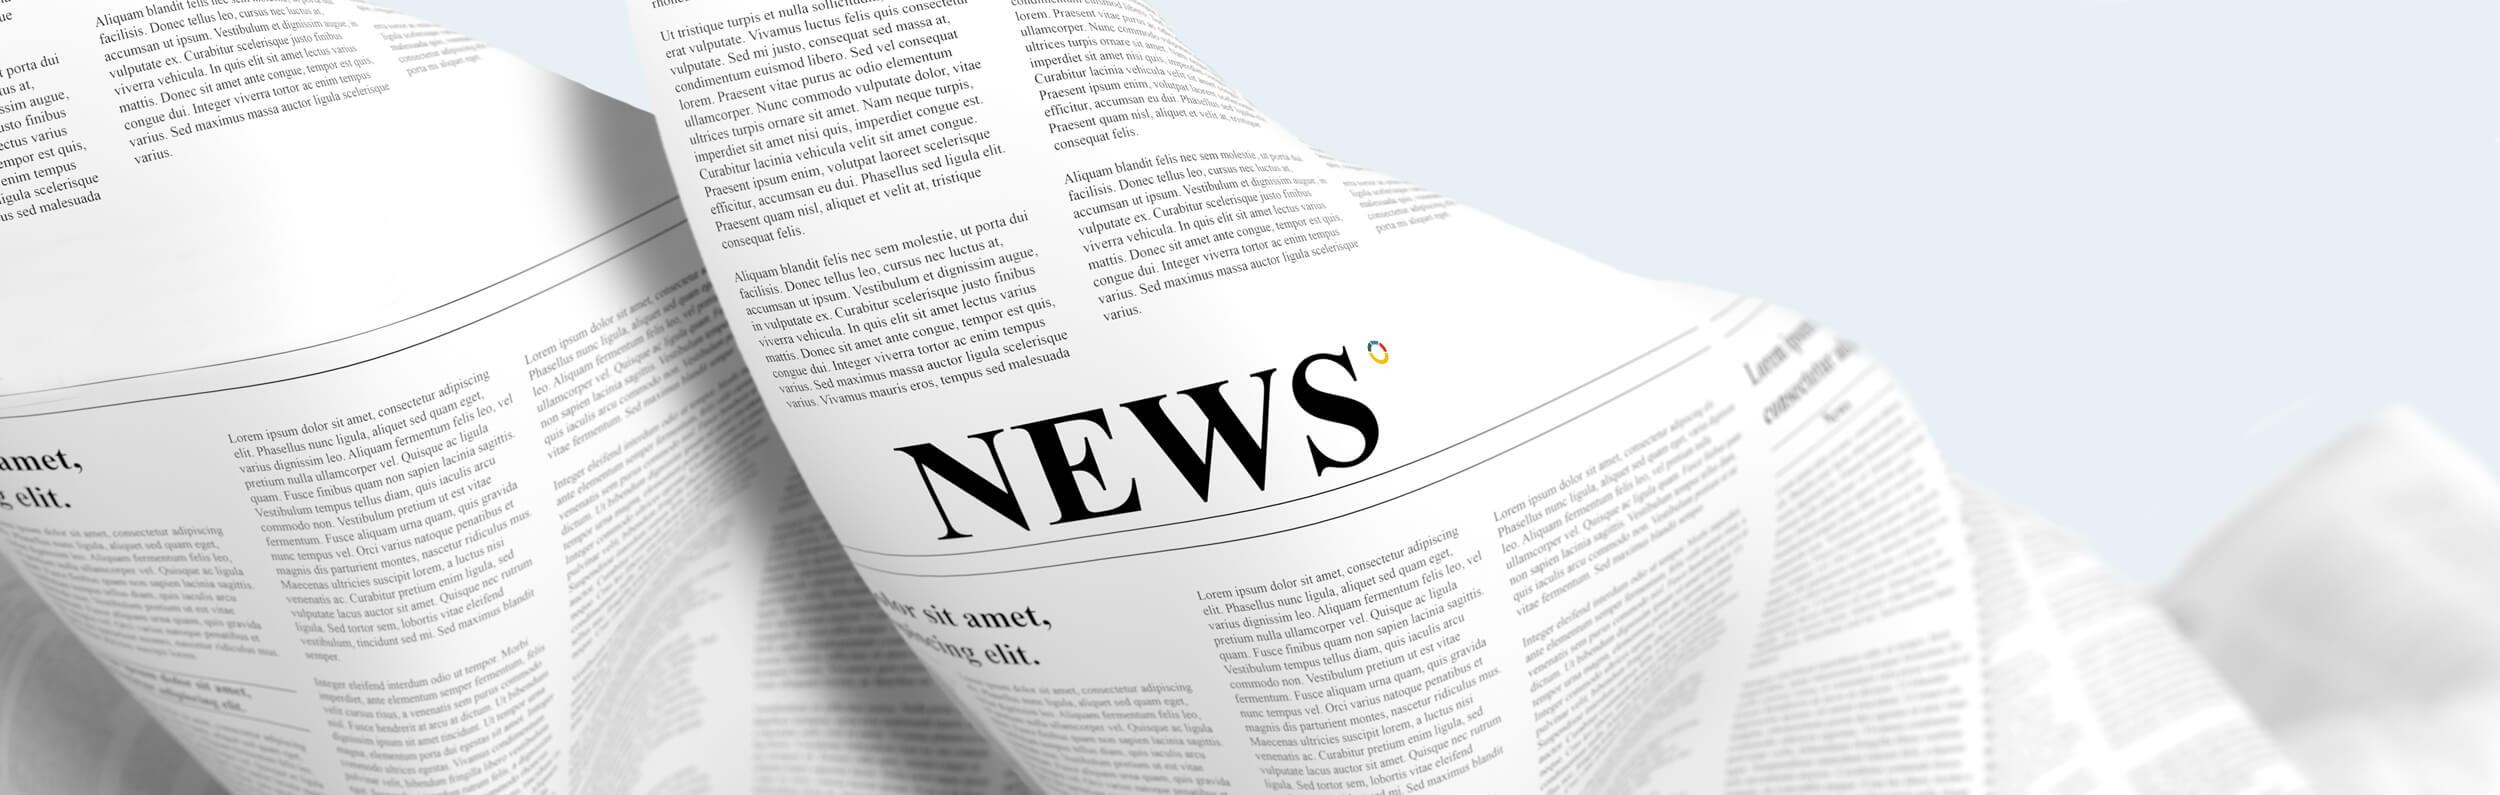 A newspaper subtly displaying the Adria logo